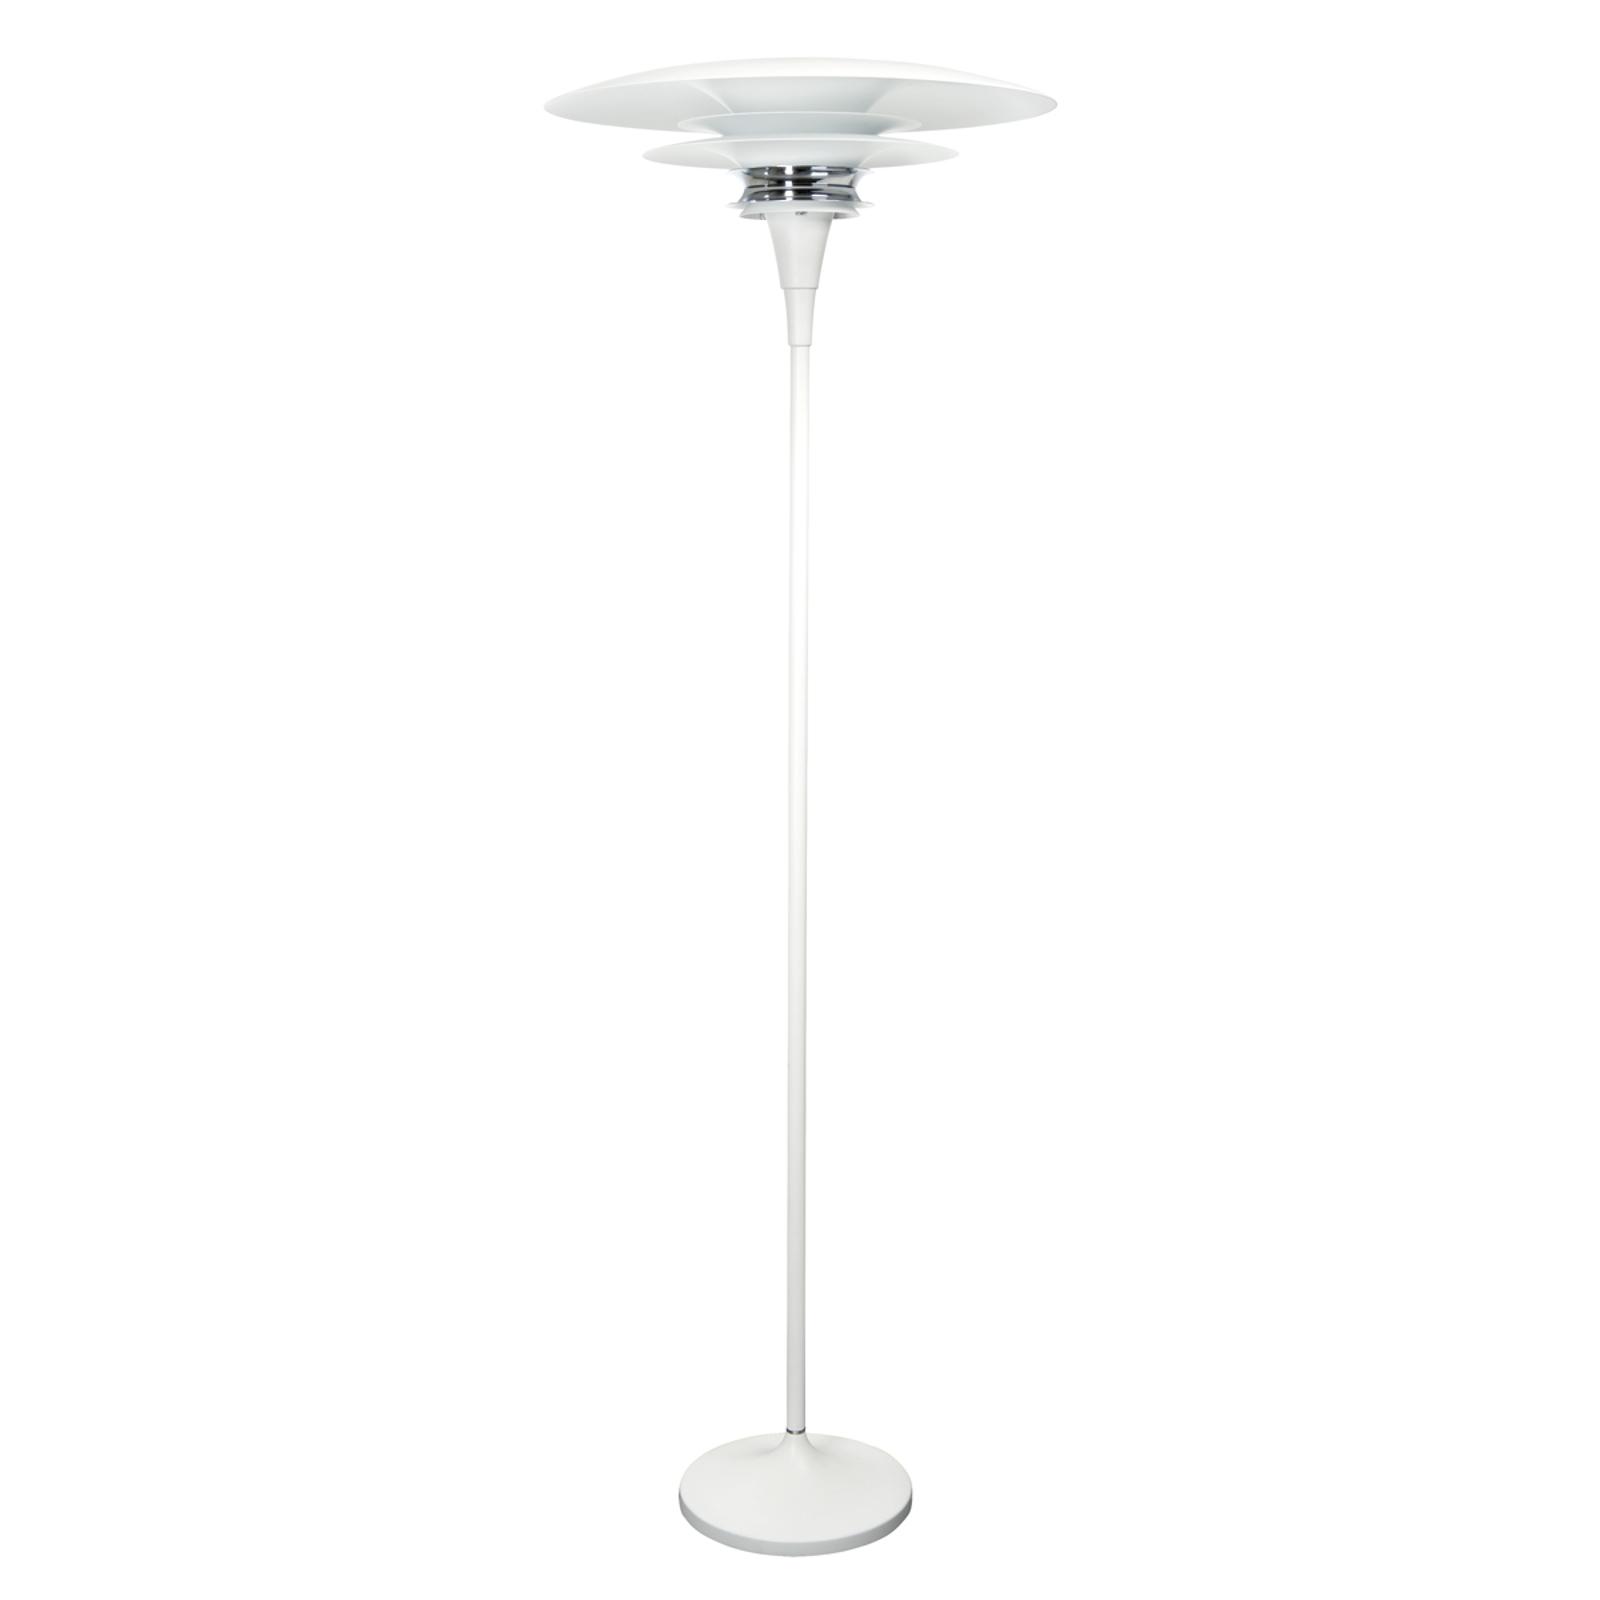 Diablo gulvlampe i hvid - integreret lysdæmper